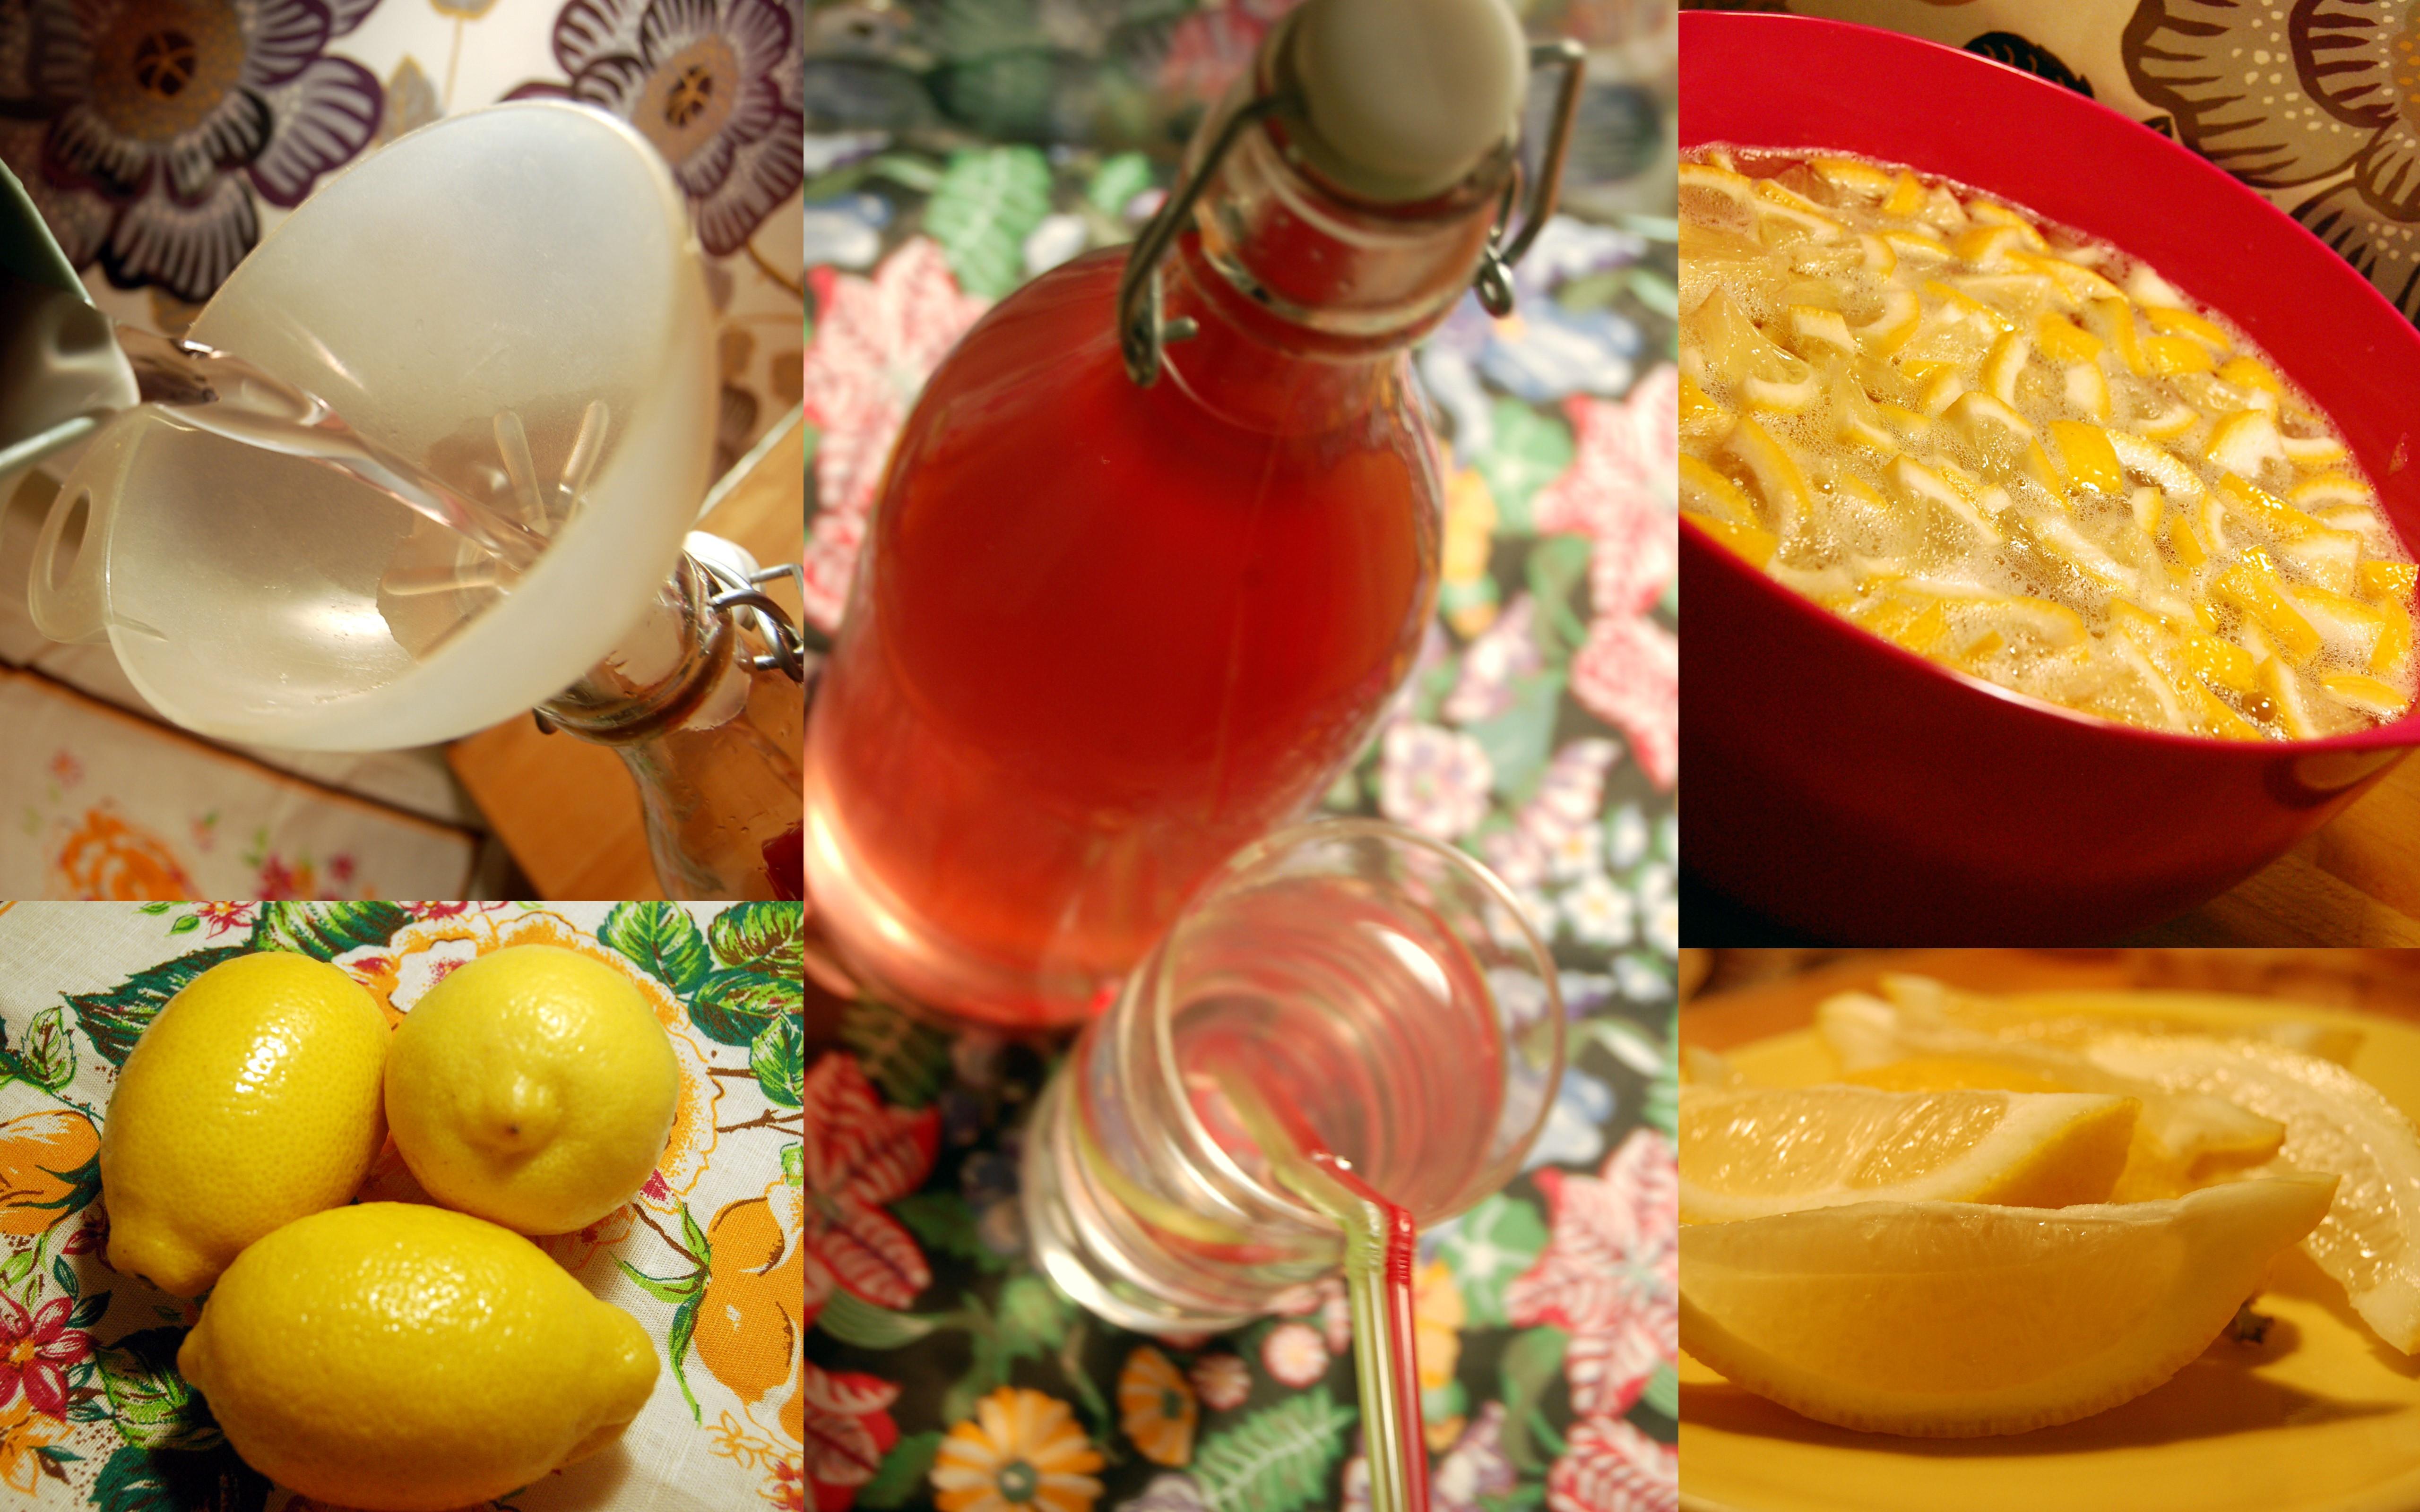 Rosa lemonad recept